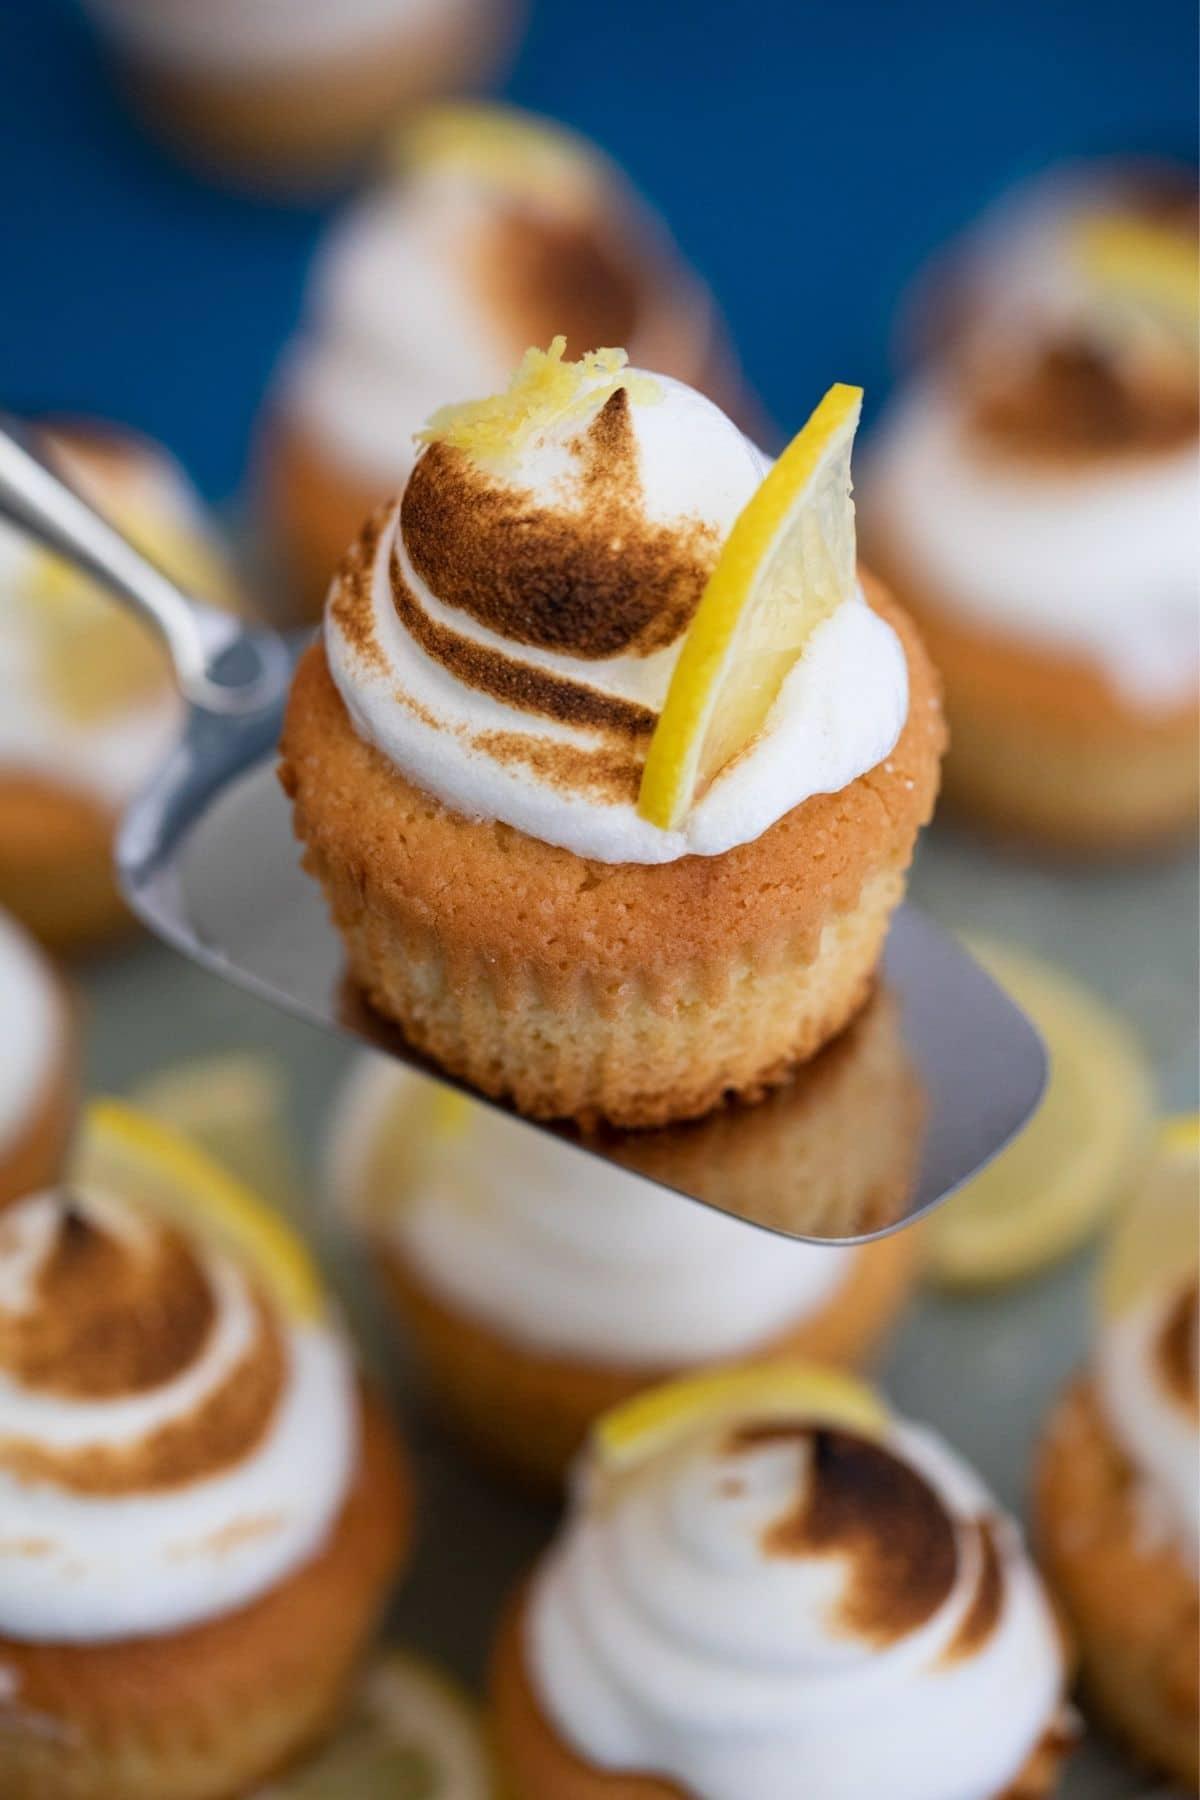 Cupcake on spatula